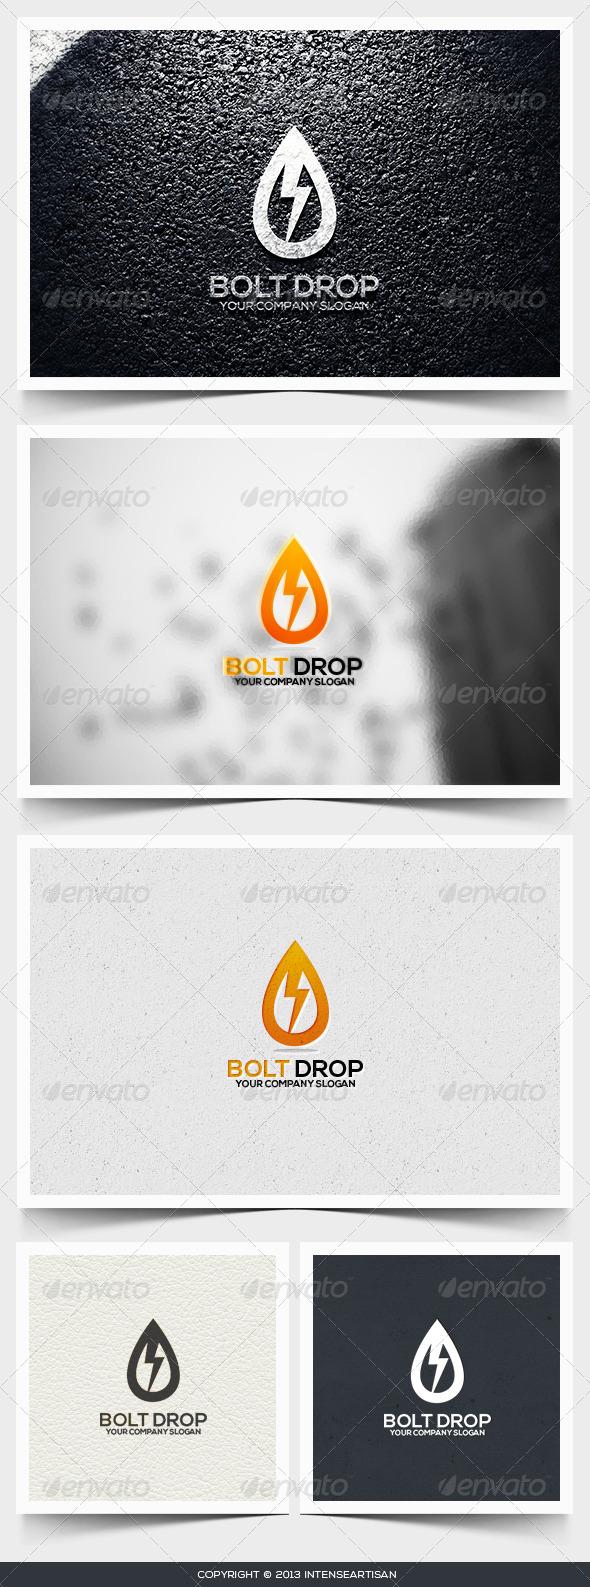 Bolt Drop Logo Template - Objects Logo Templates